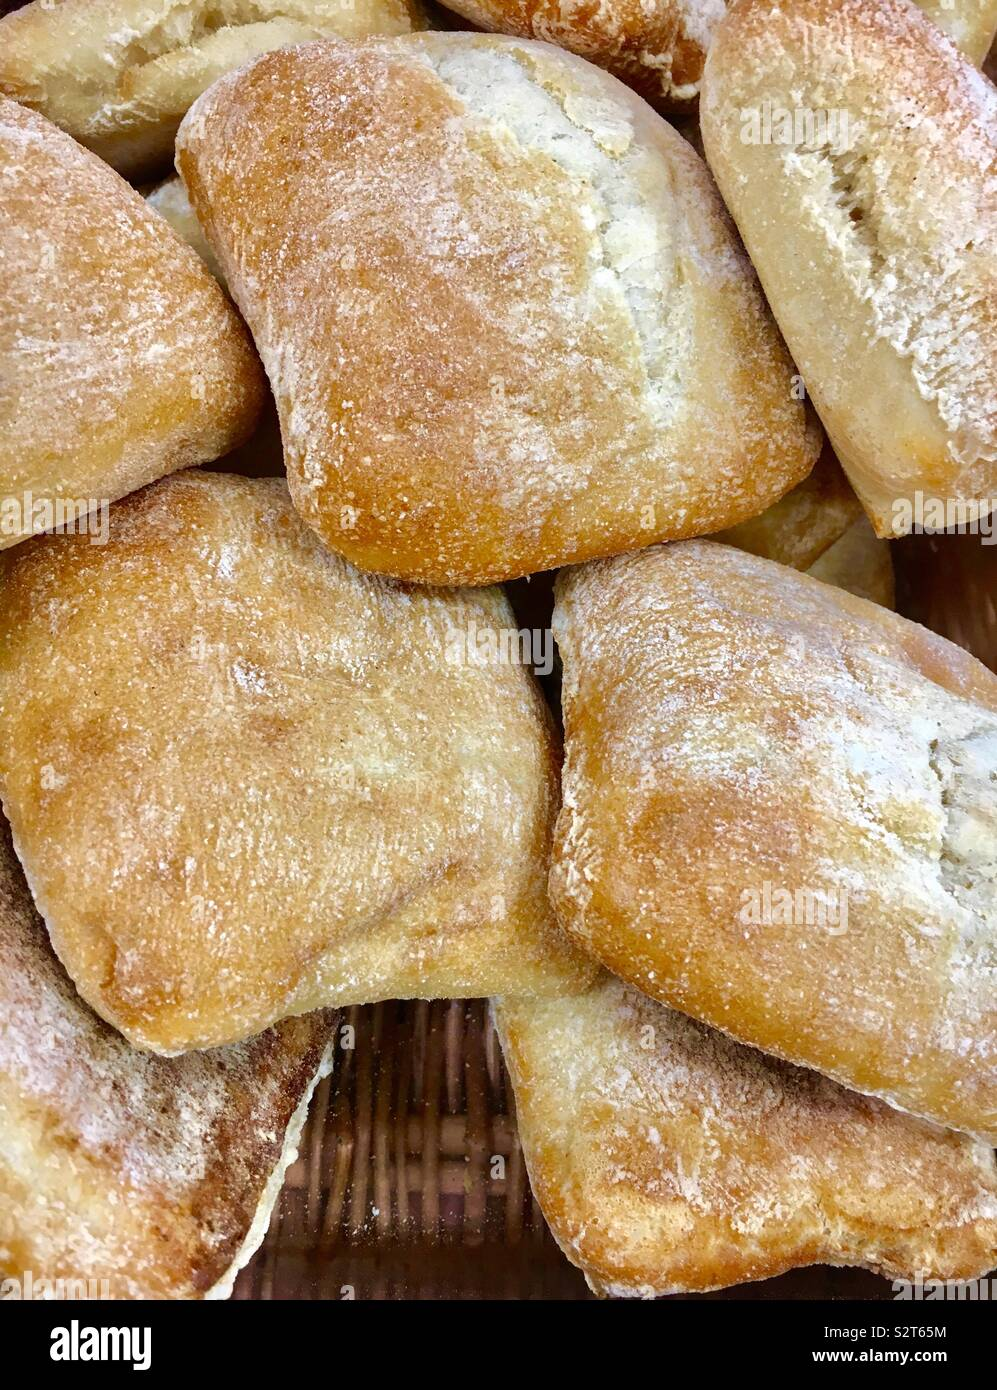 Basket full of freshly baked ciabatta bread on sale at a bakery Stock Photo